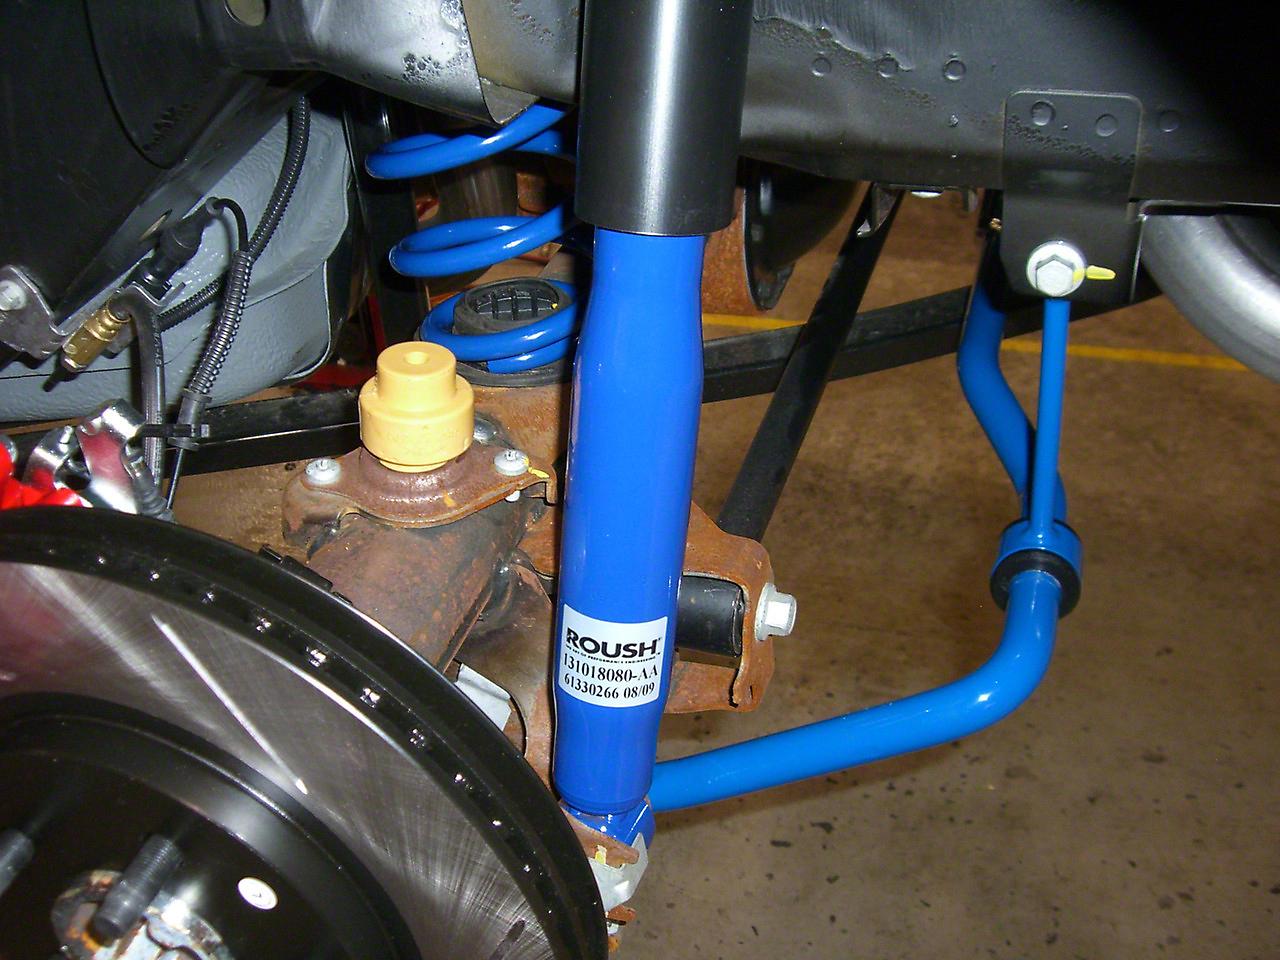 Roush Track Suspension Kit (11-14 GT)